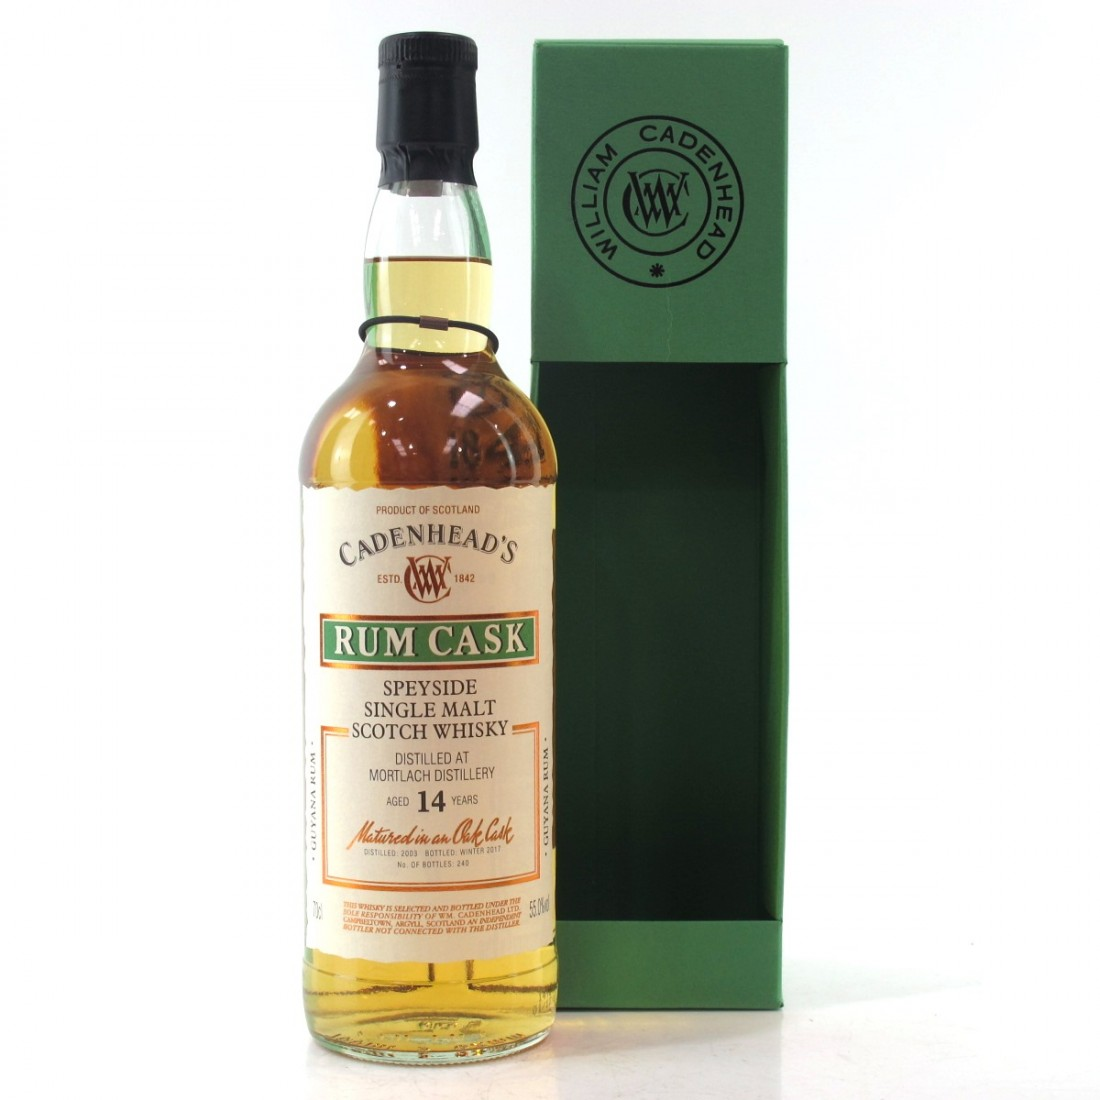 Mortlach 2003 Cadenhead's 14 Year Old Rum Cask